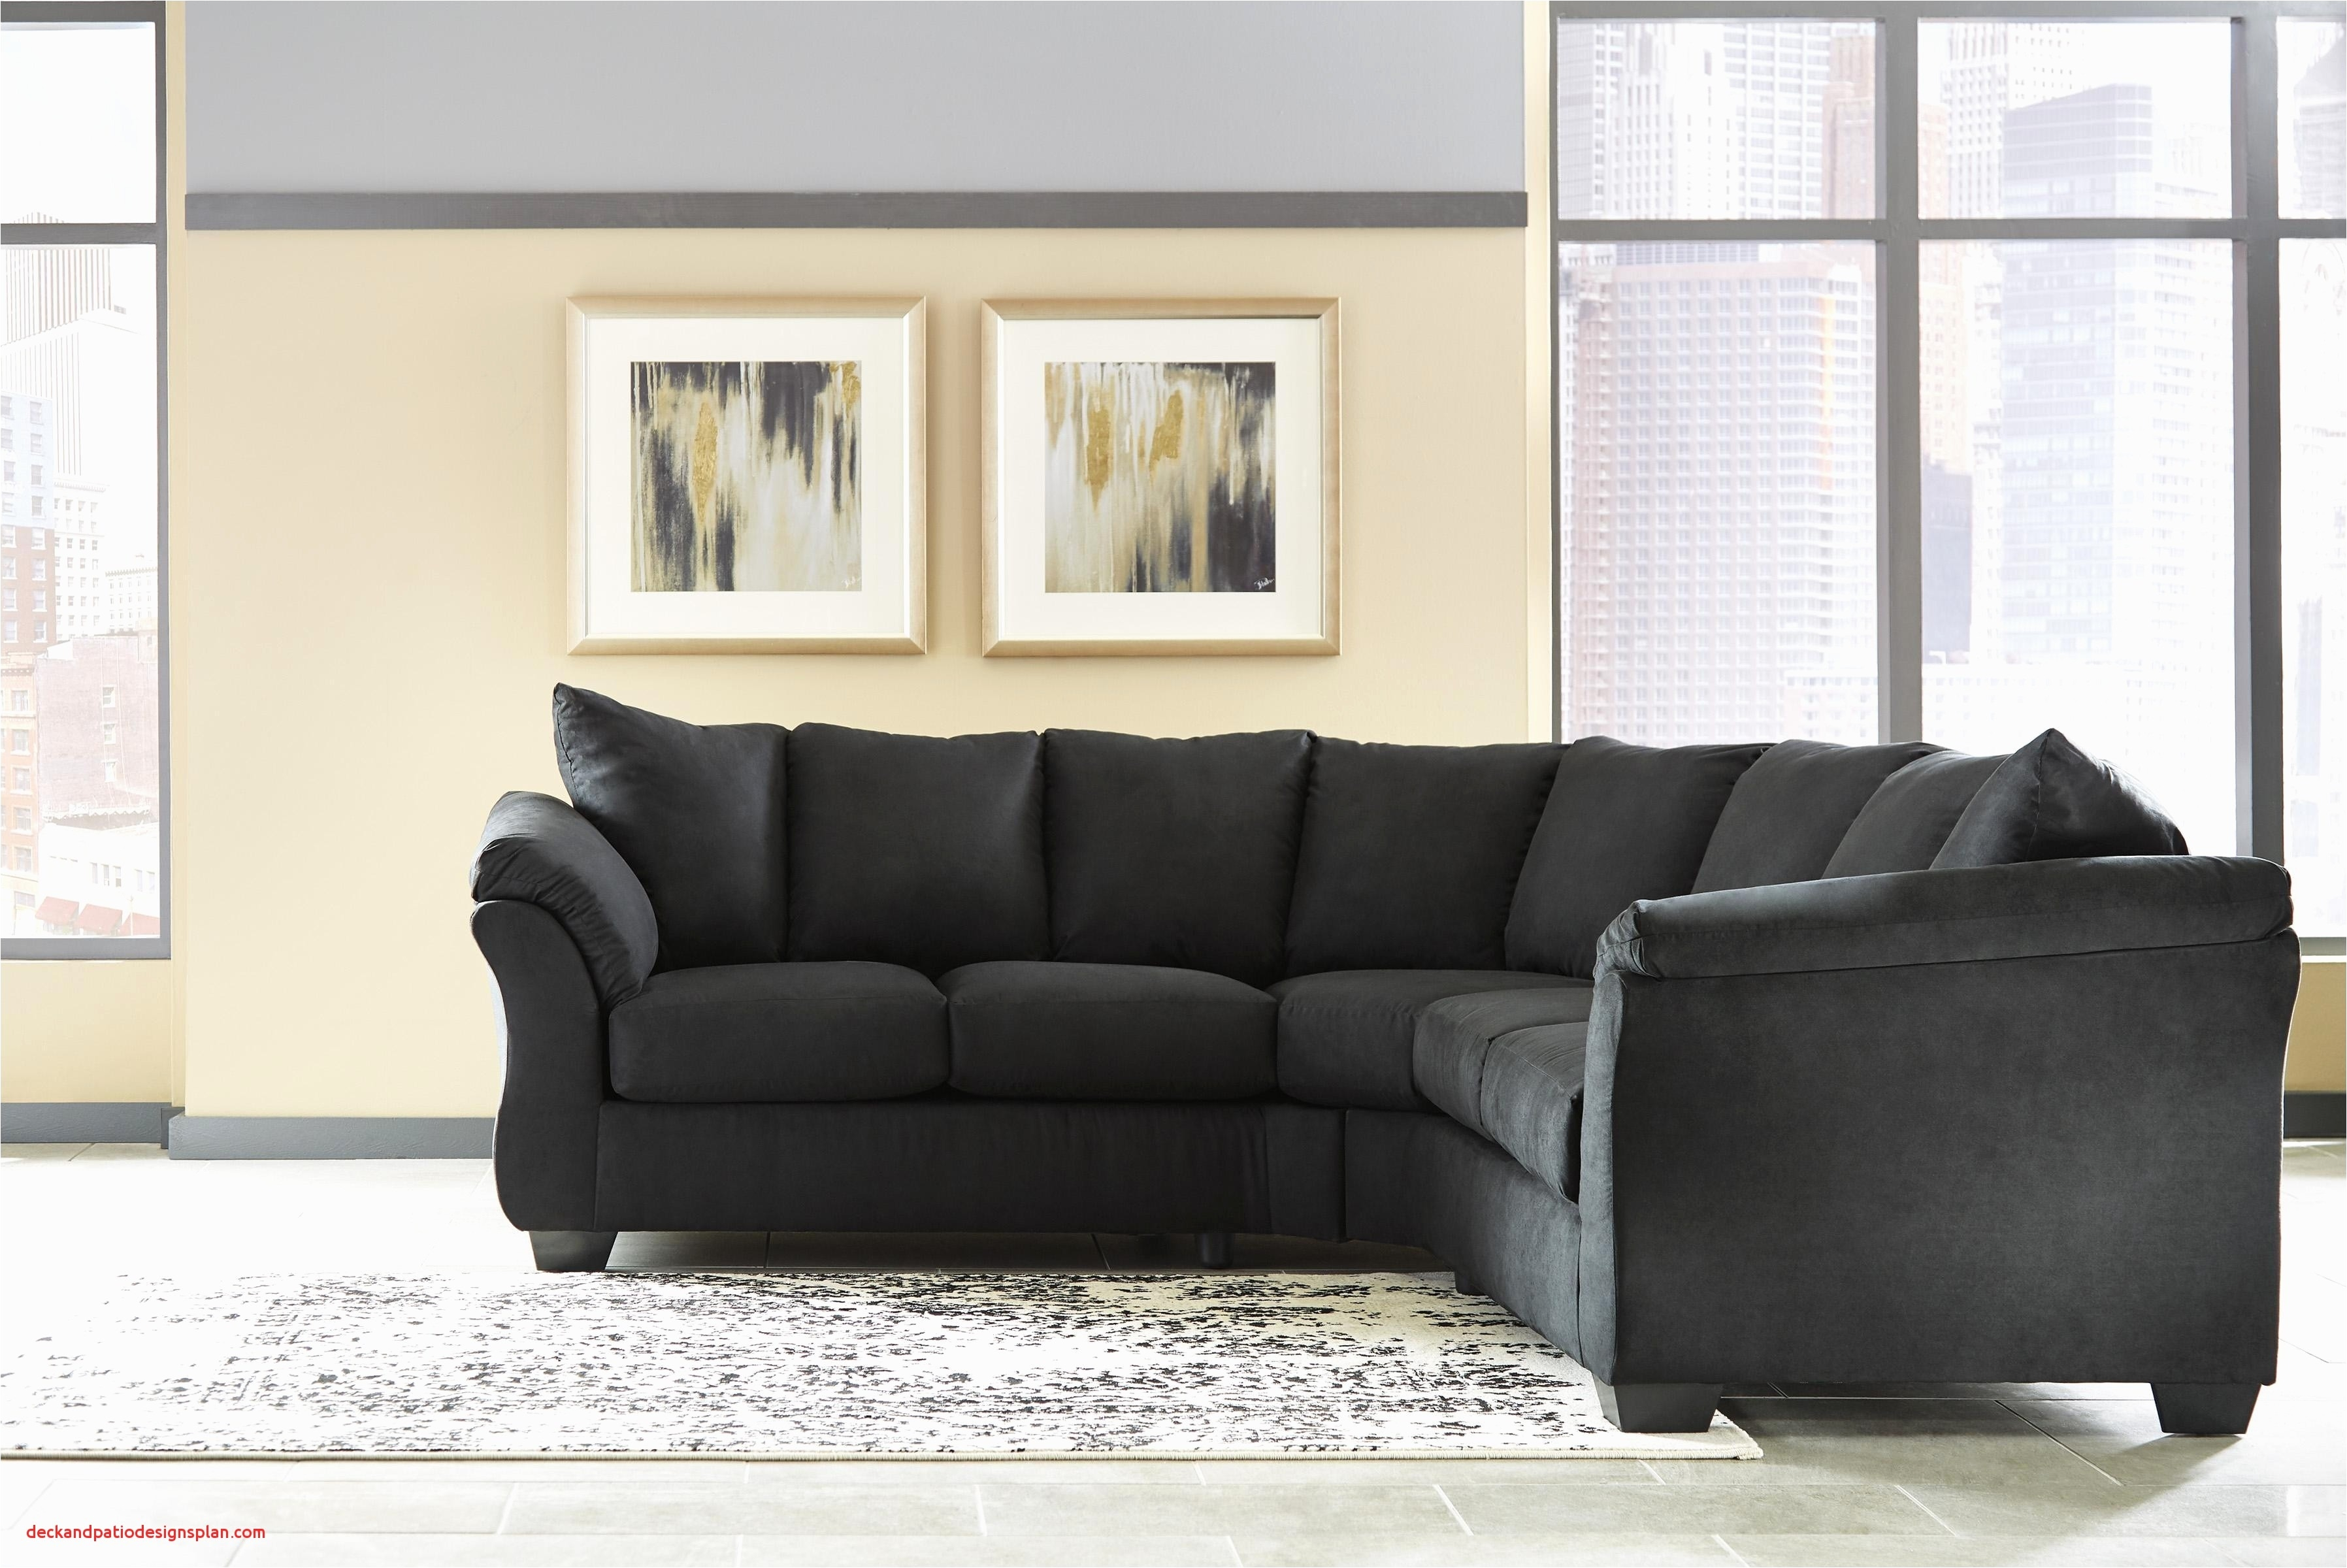 white sofa chair luxury gunstiges sofa sofa big gunstige sofa macys furniture 0d archives